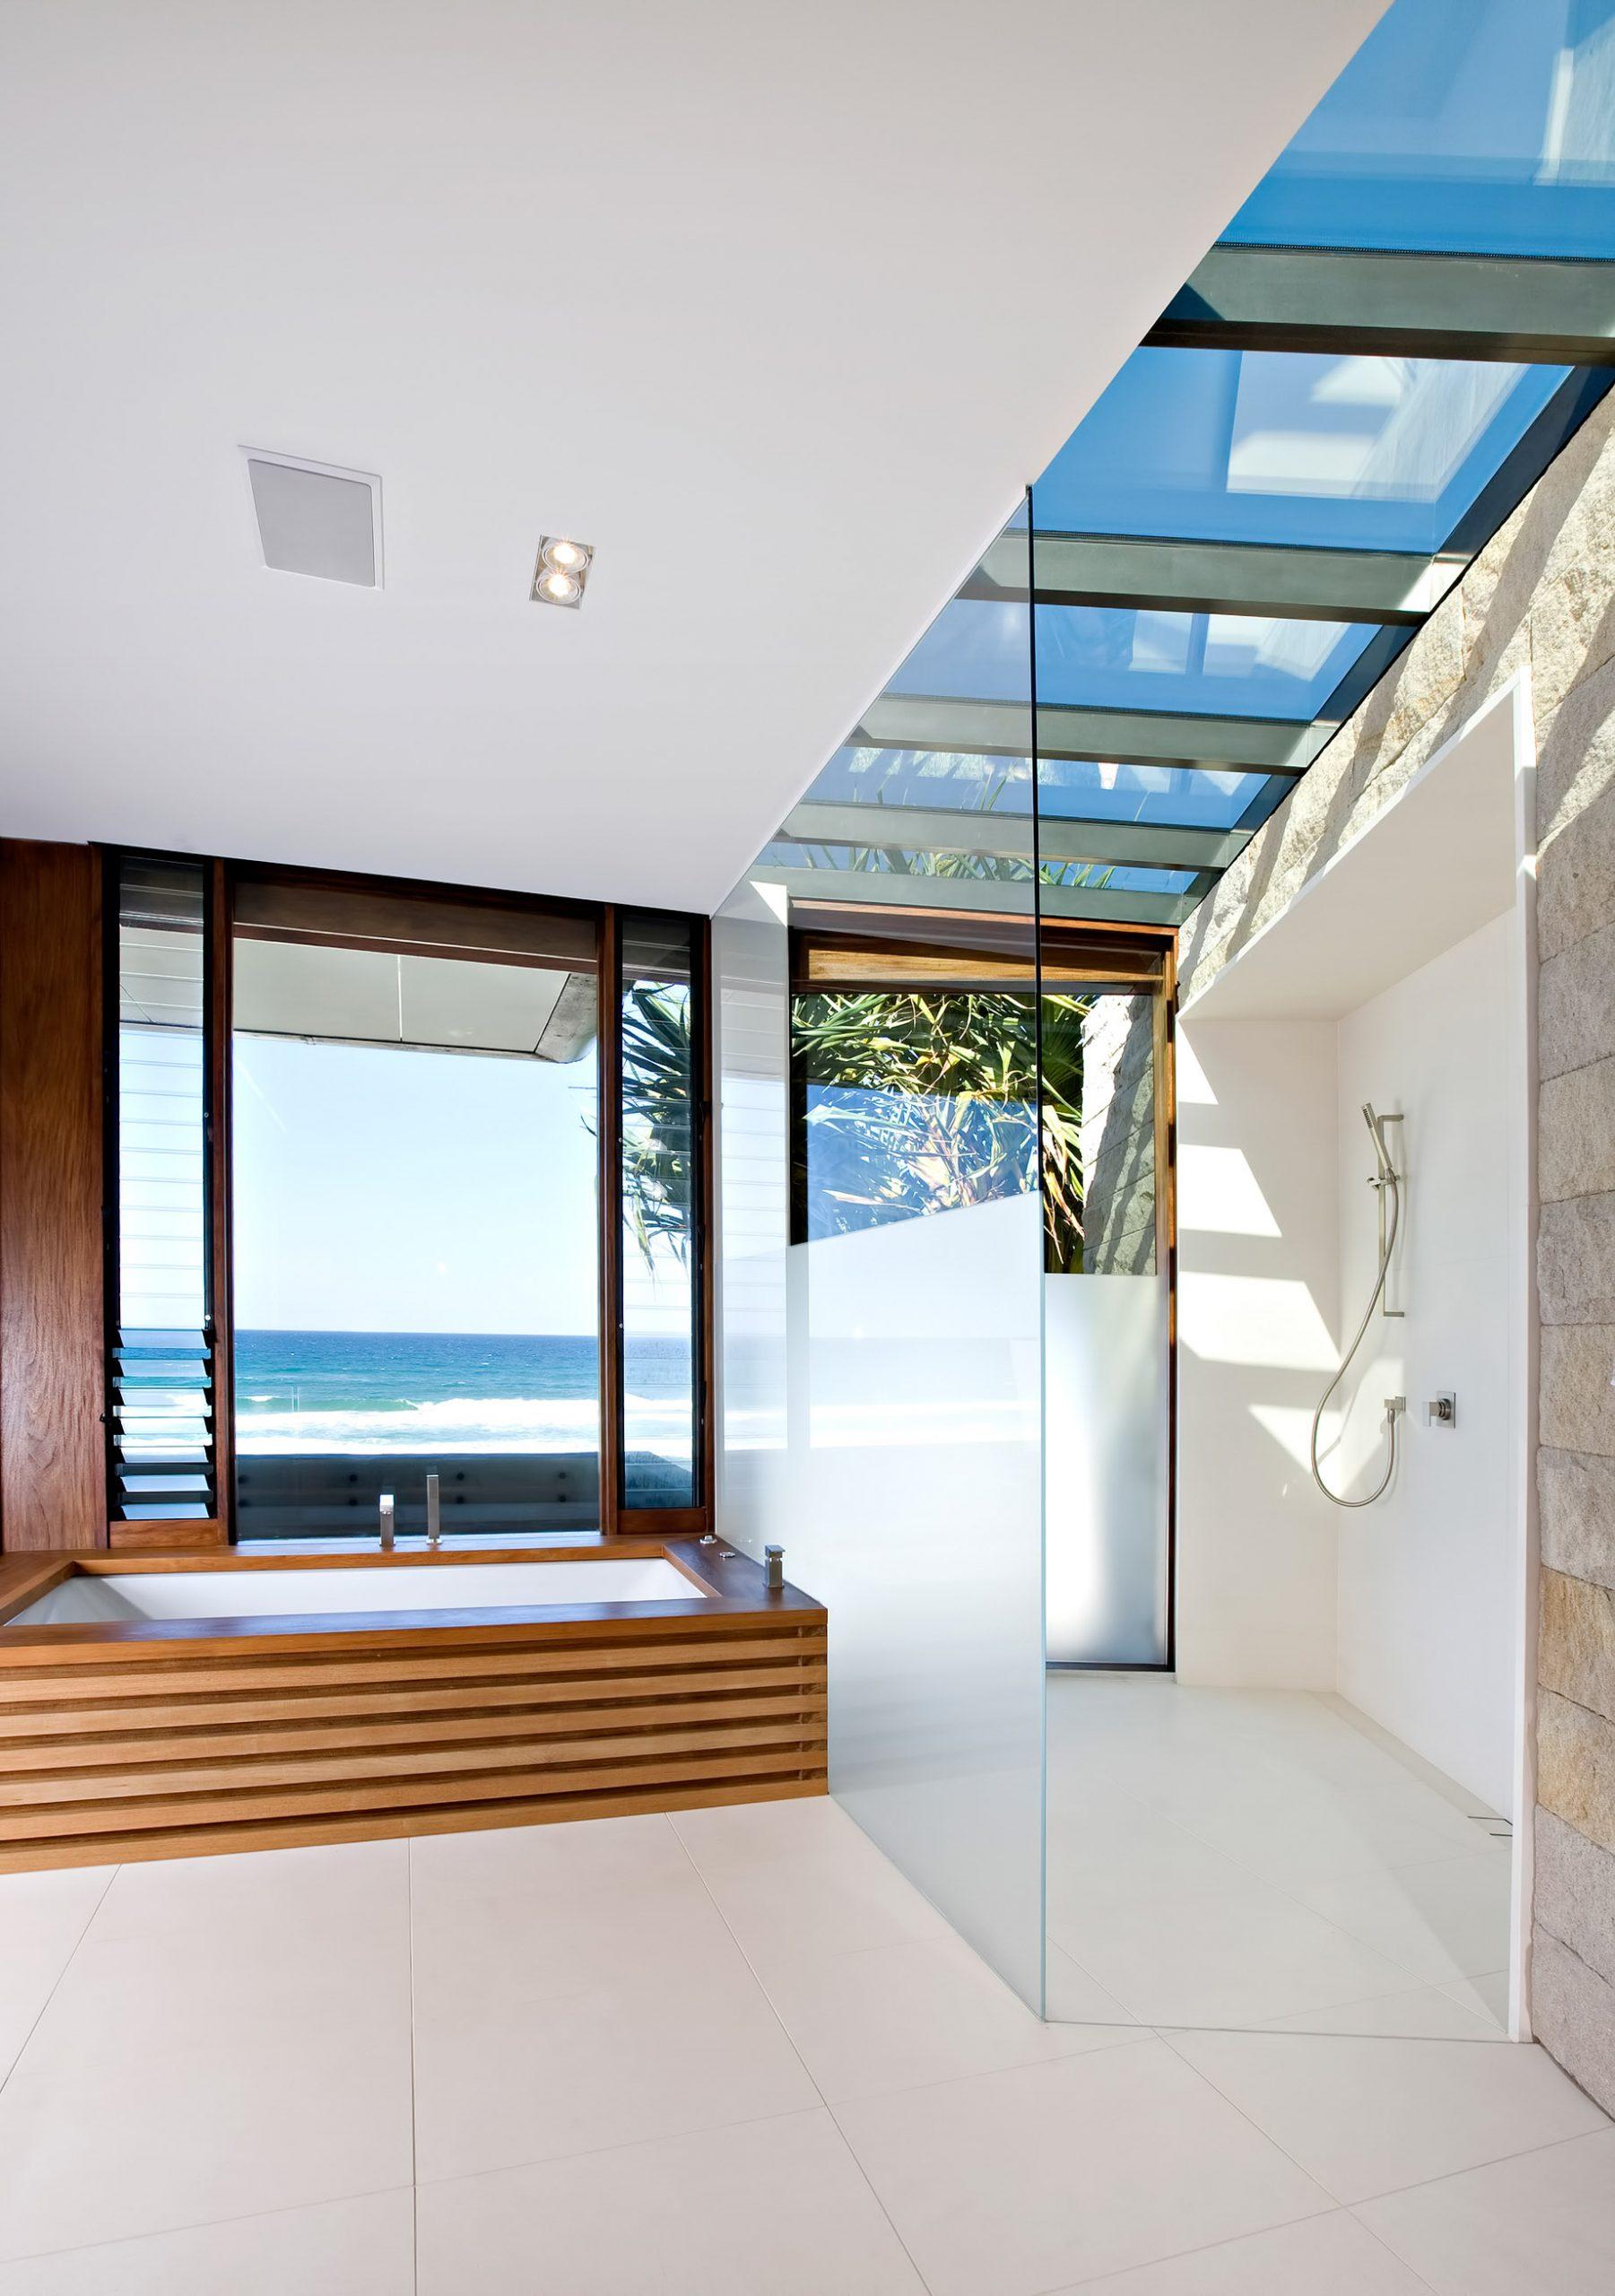 1 Albatross Residence - Mermaid Beach, Gold Coast, QLD, Australia